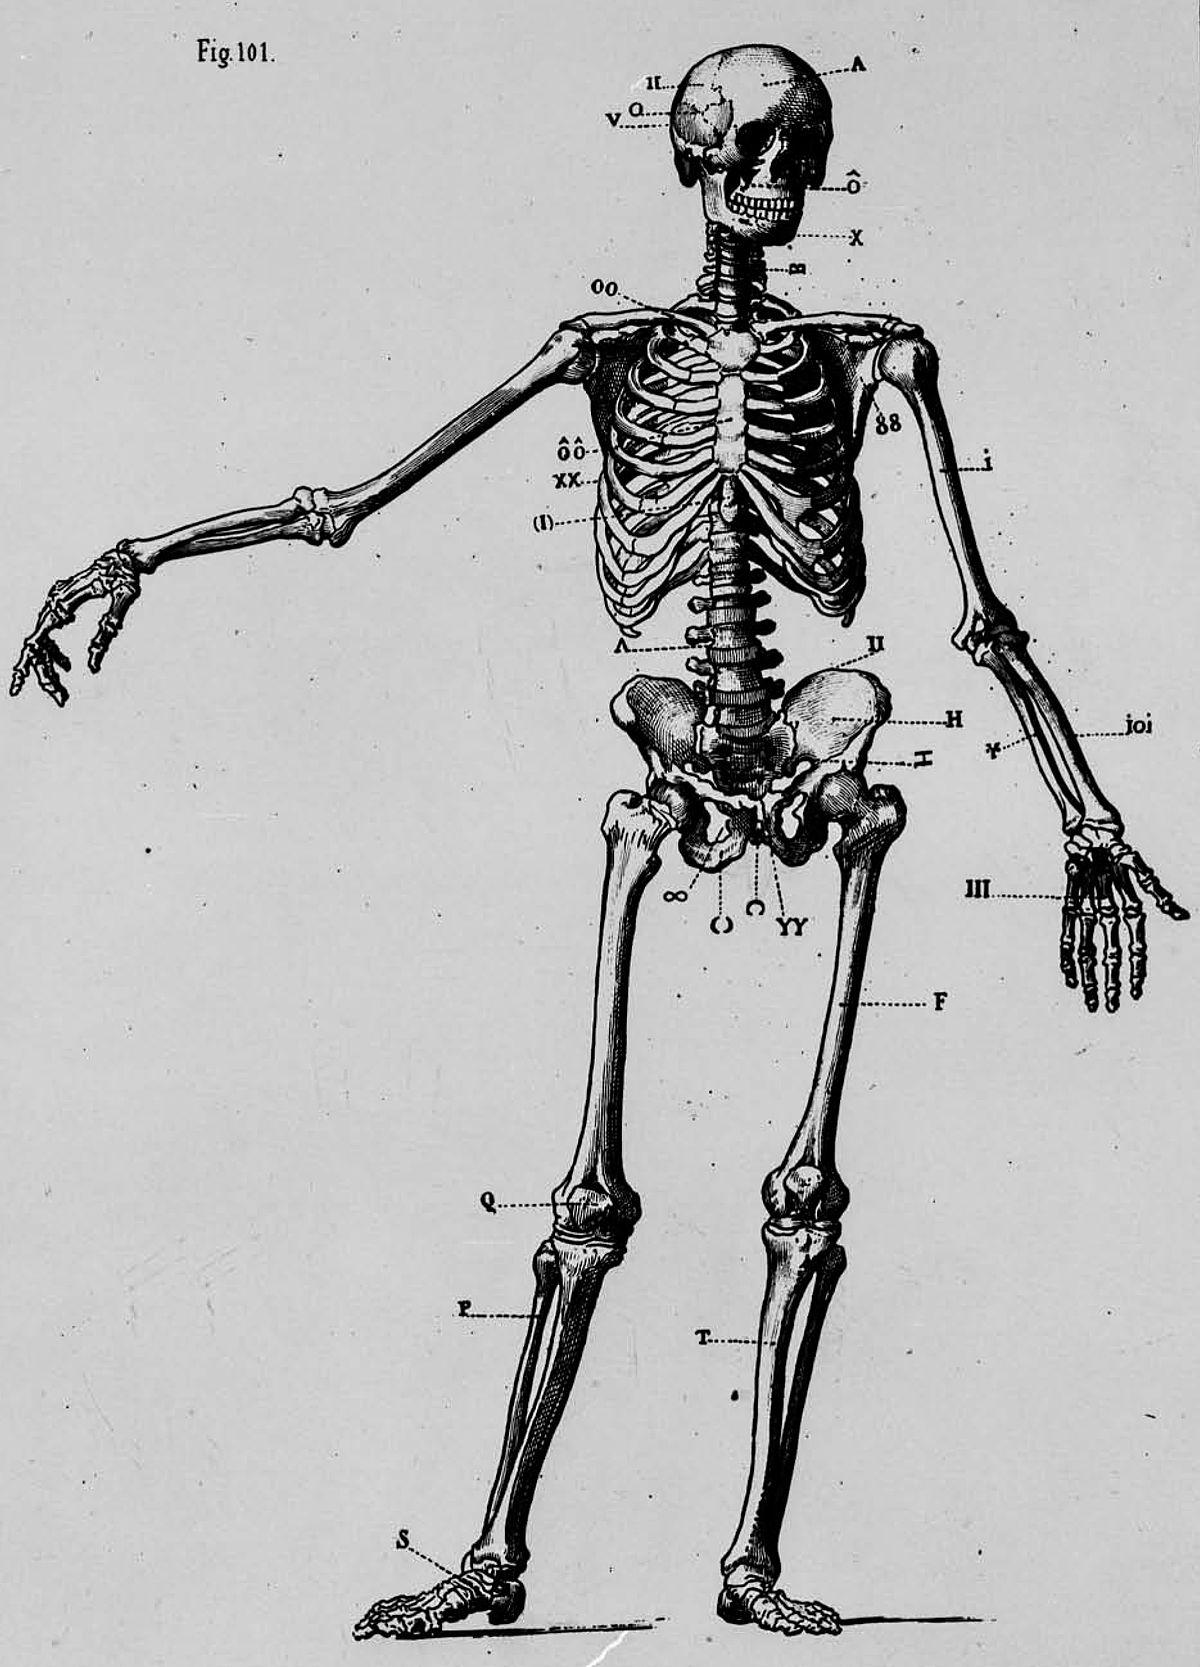 Cadarma humana - Wikipedia